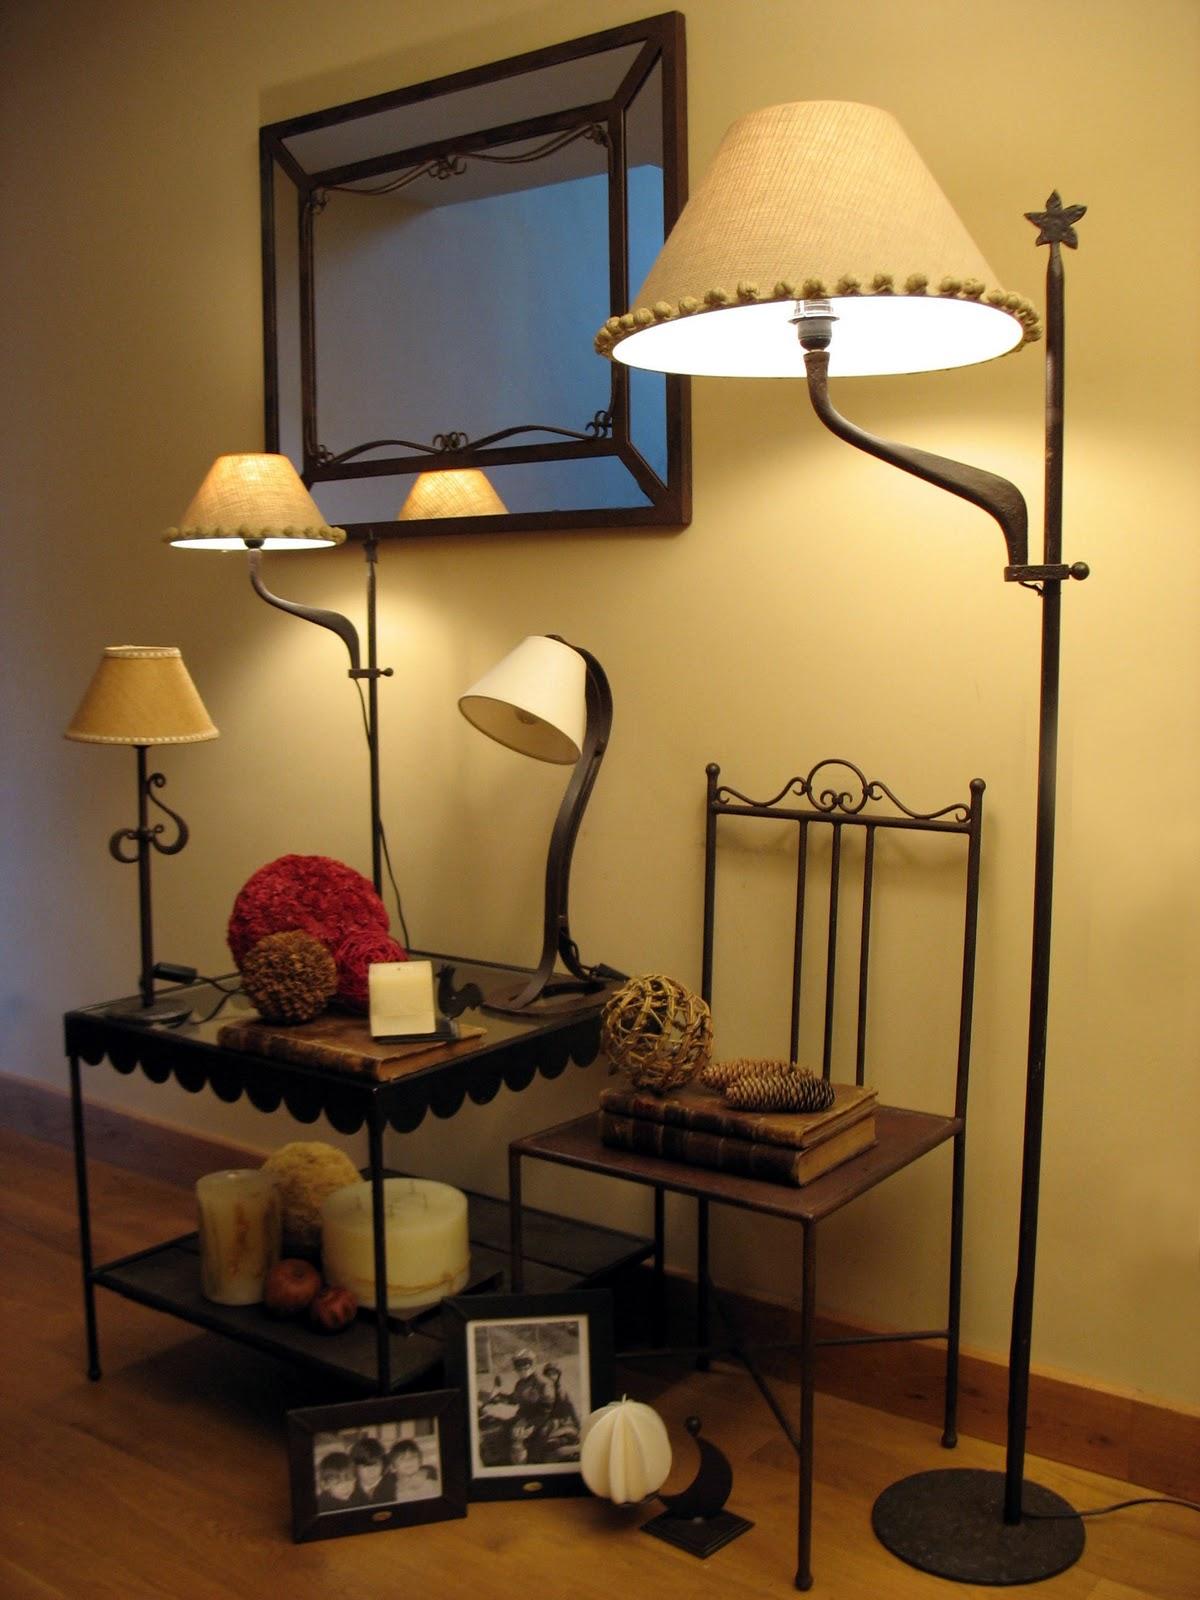 Tocaferro by jl padial muebles de forja mil ideas que - Muebles en forja ...